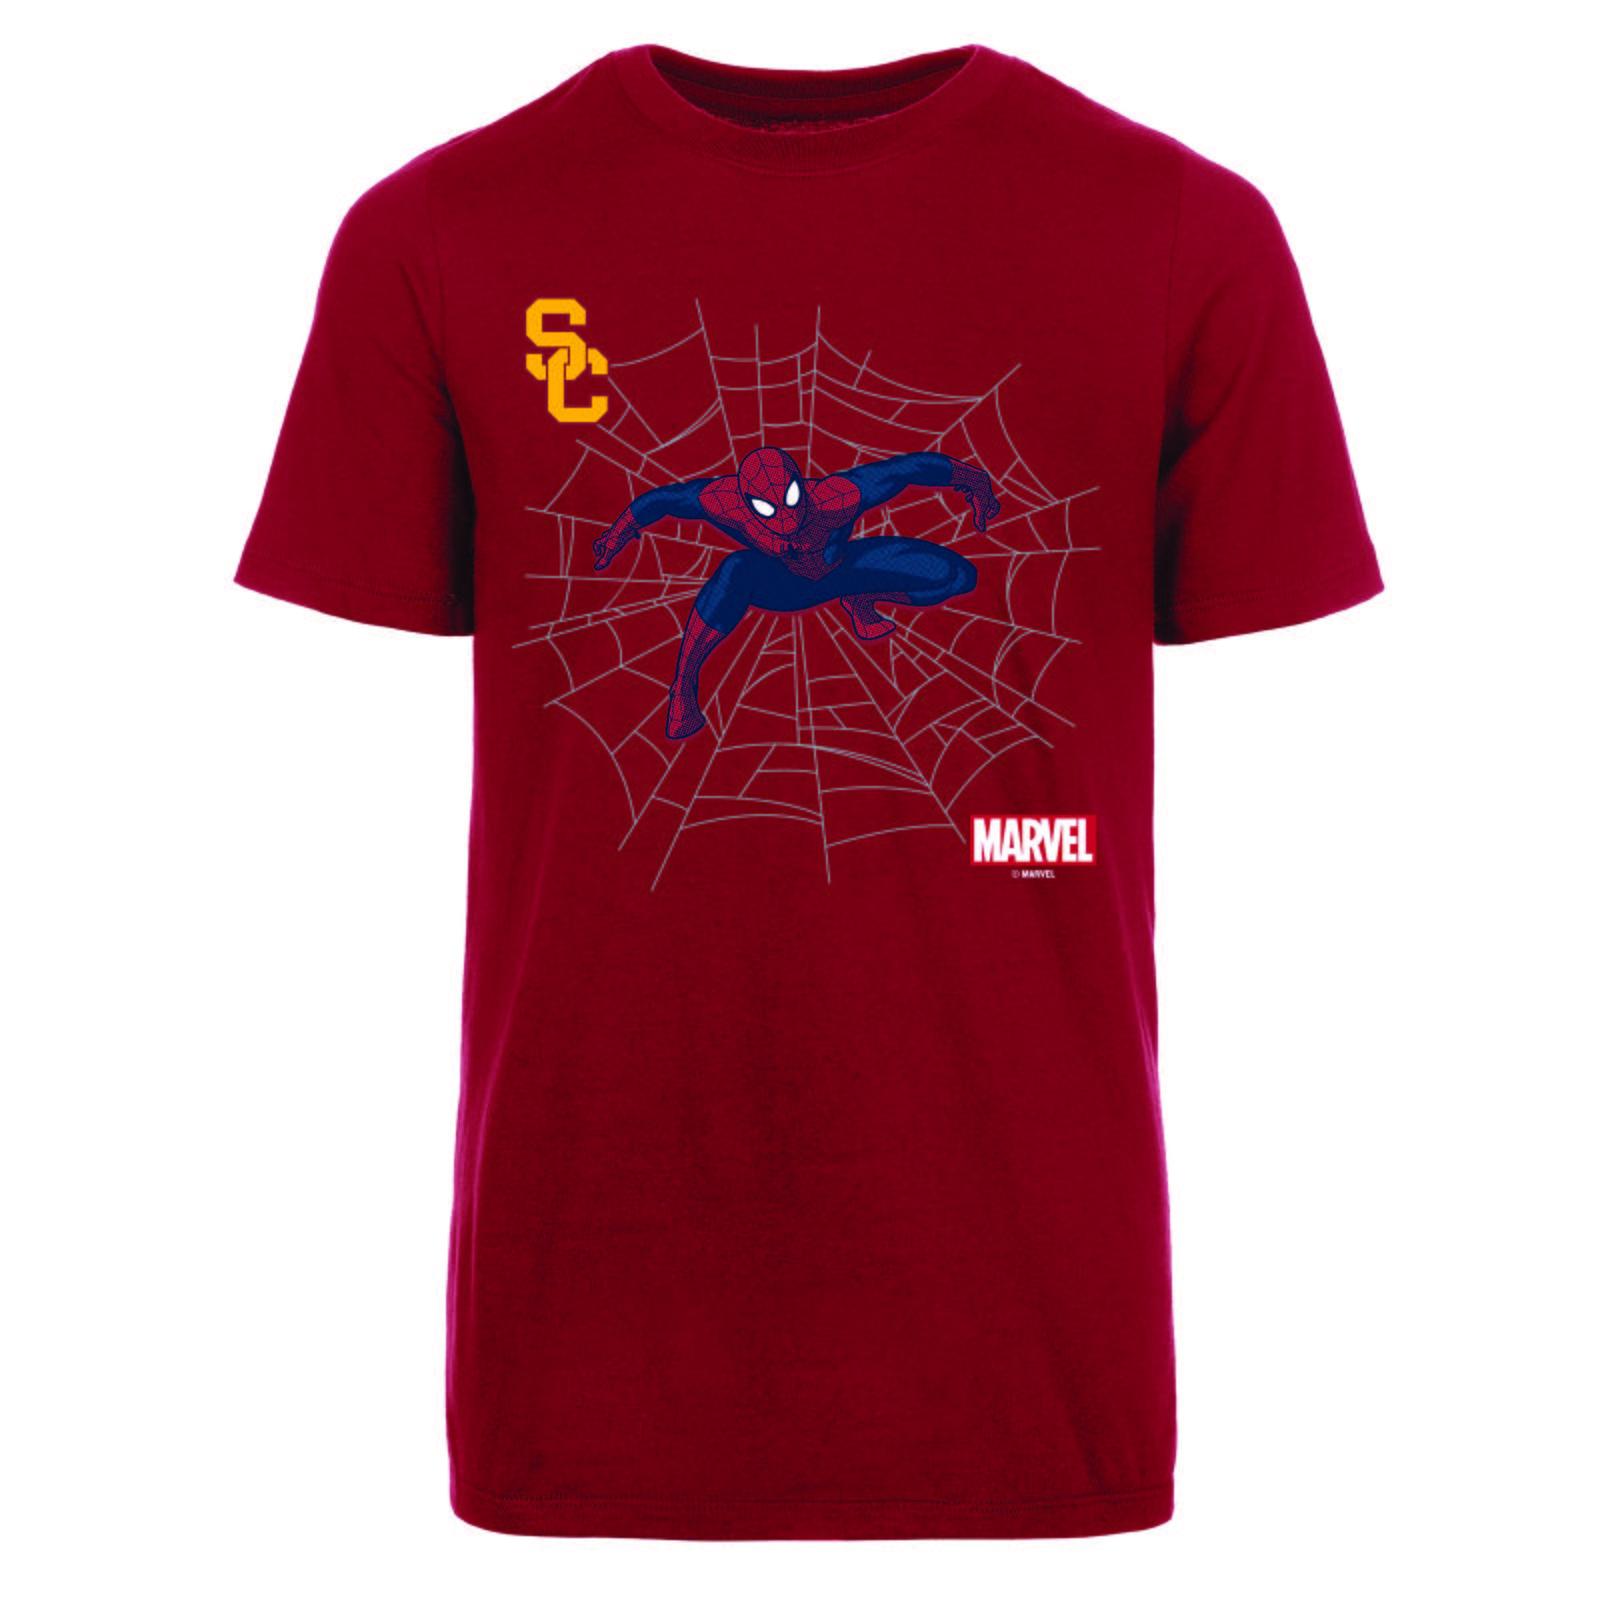 911bc84de51 USC Trojans X Marvel Youth SC Interlock Spider Man T-shirt